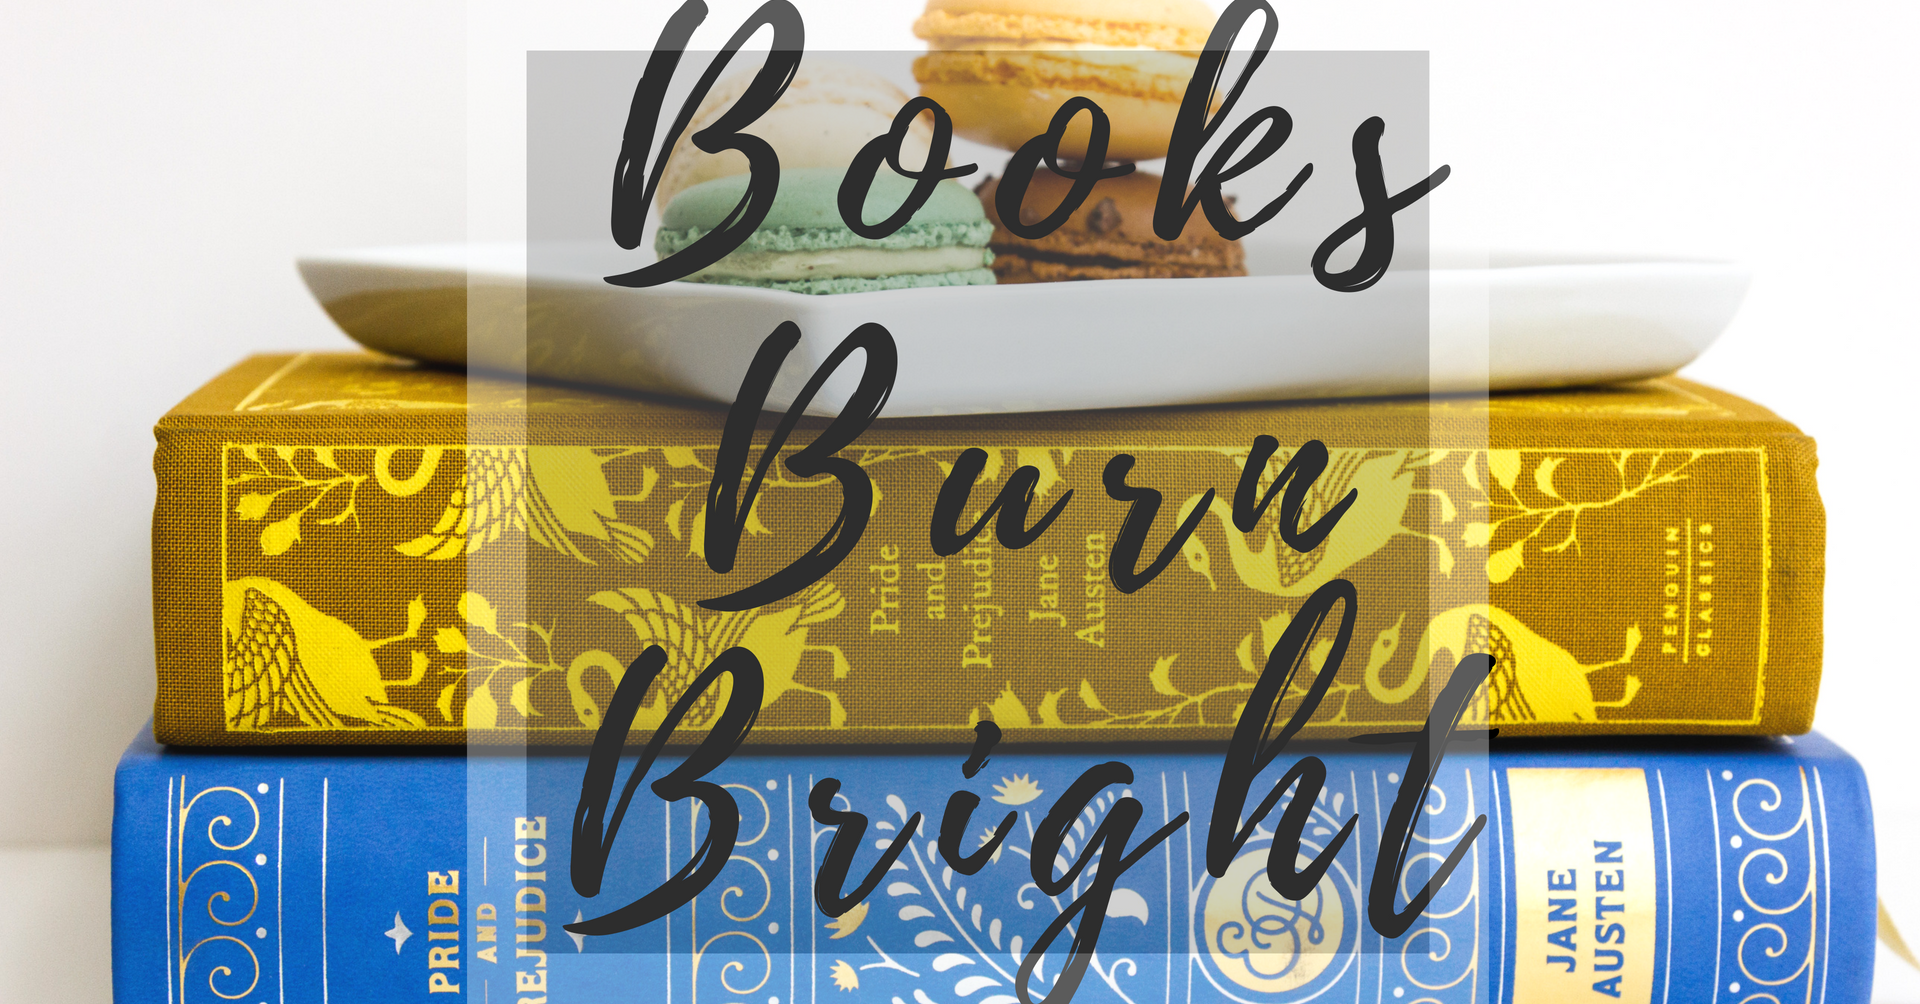 Books Burn Bright